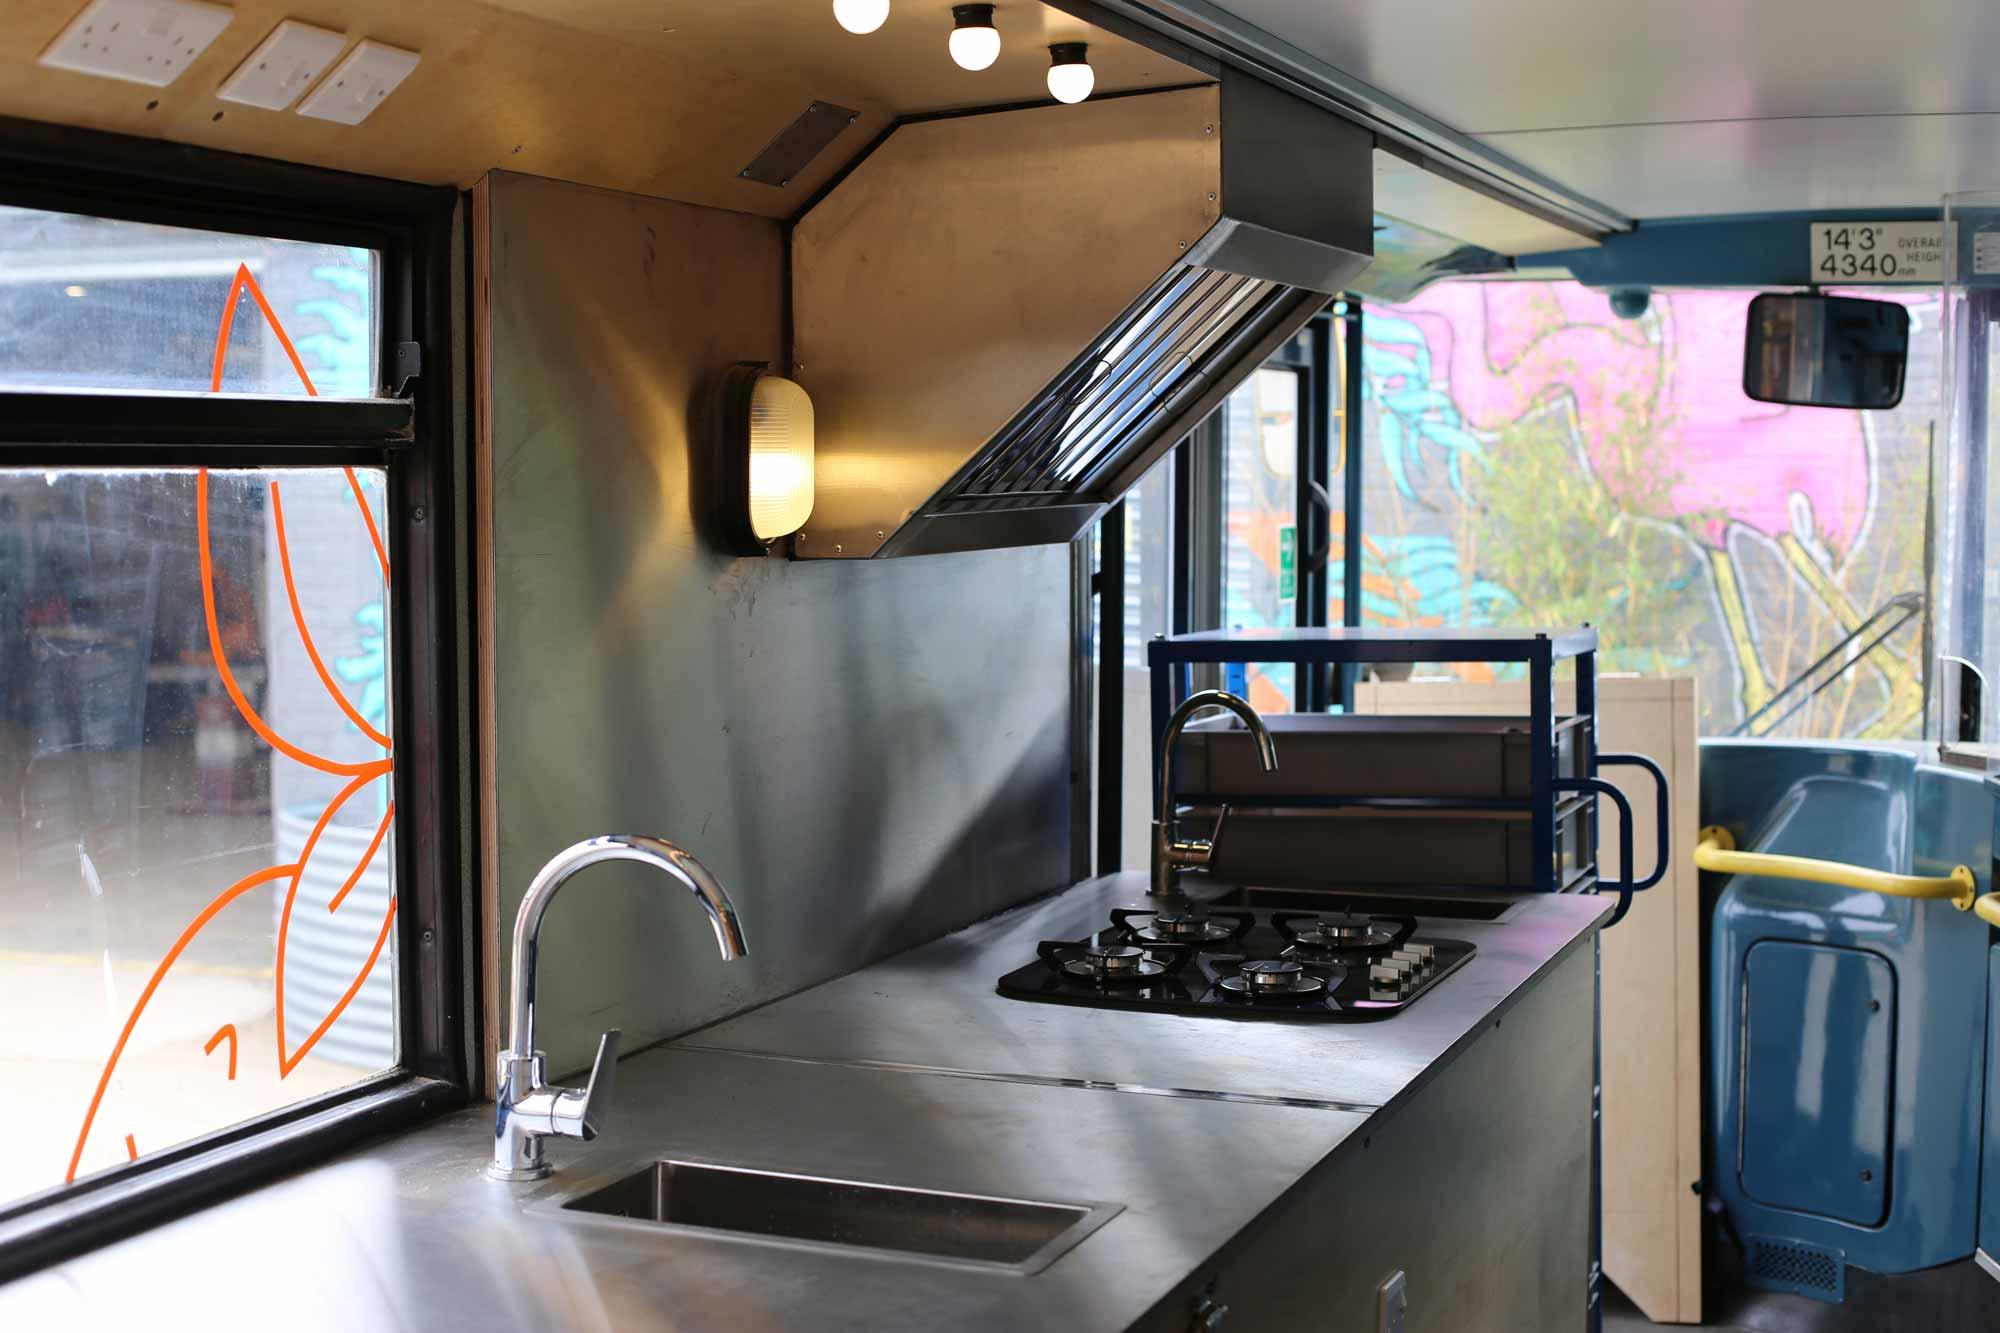 The Wandsworth Food Bus